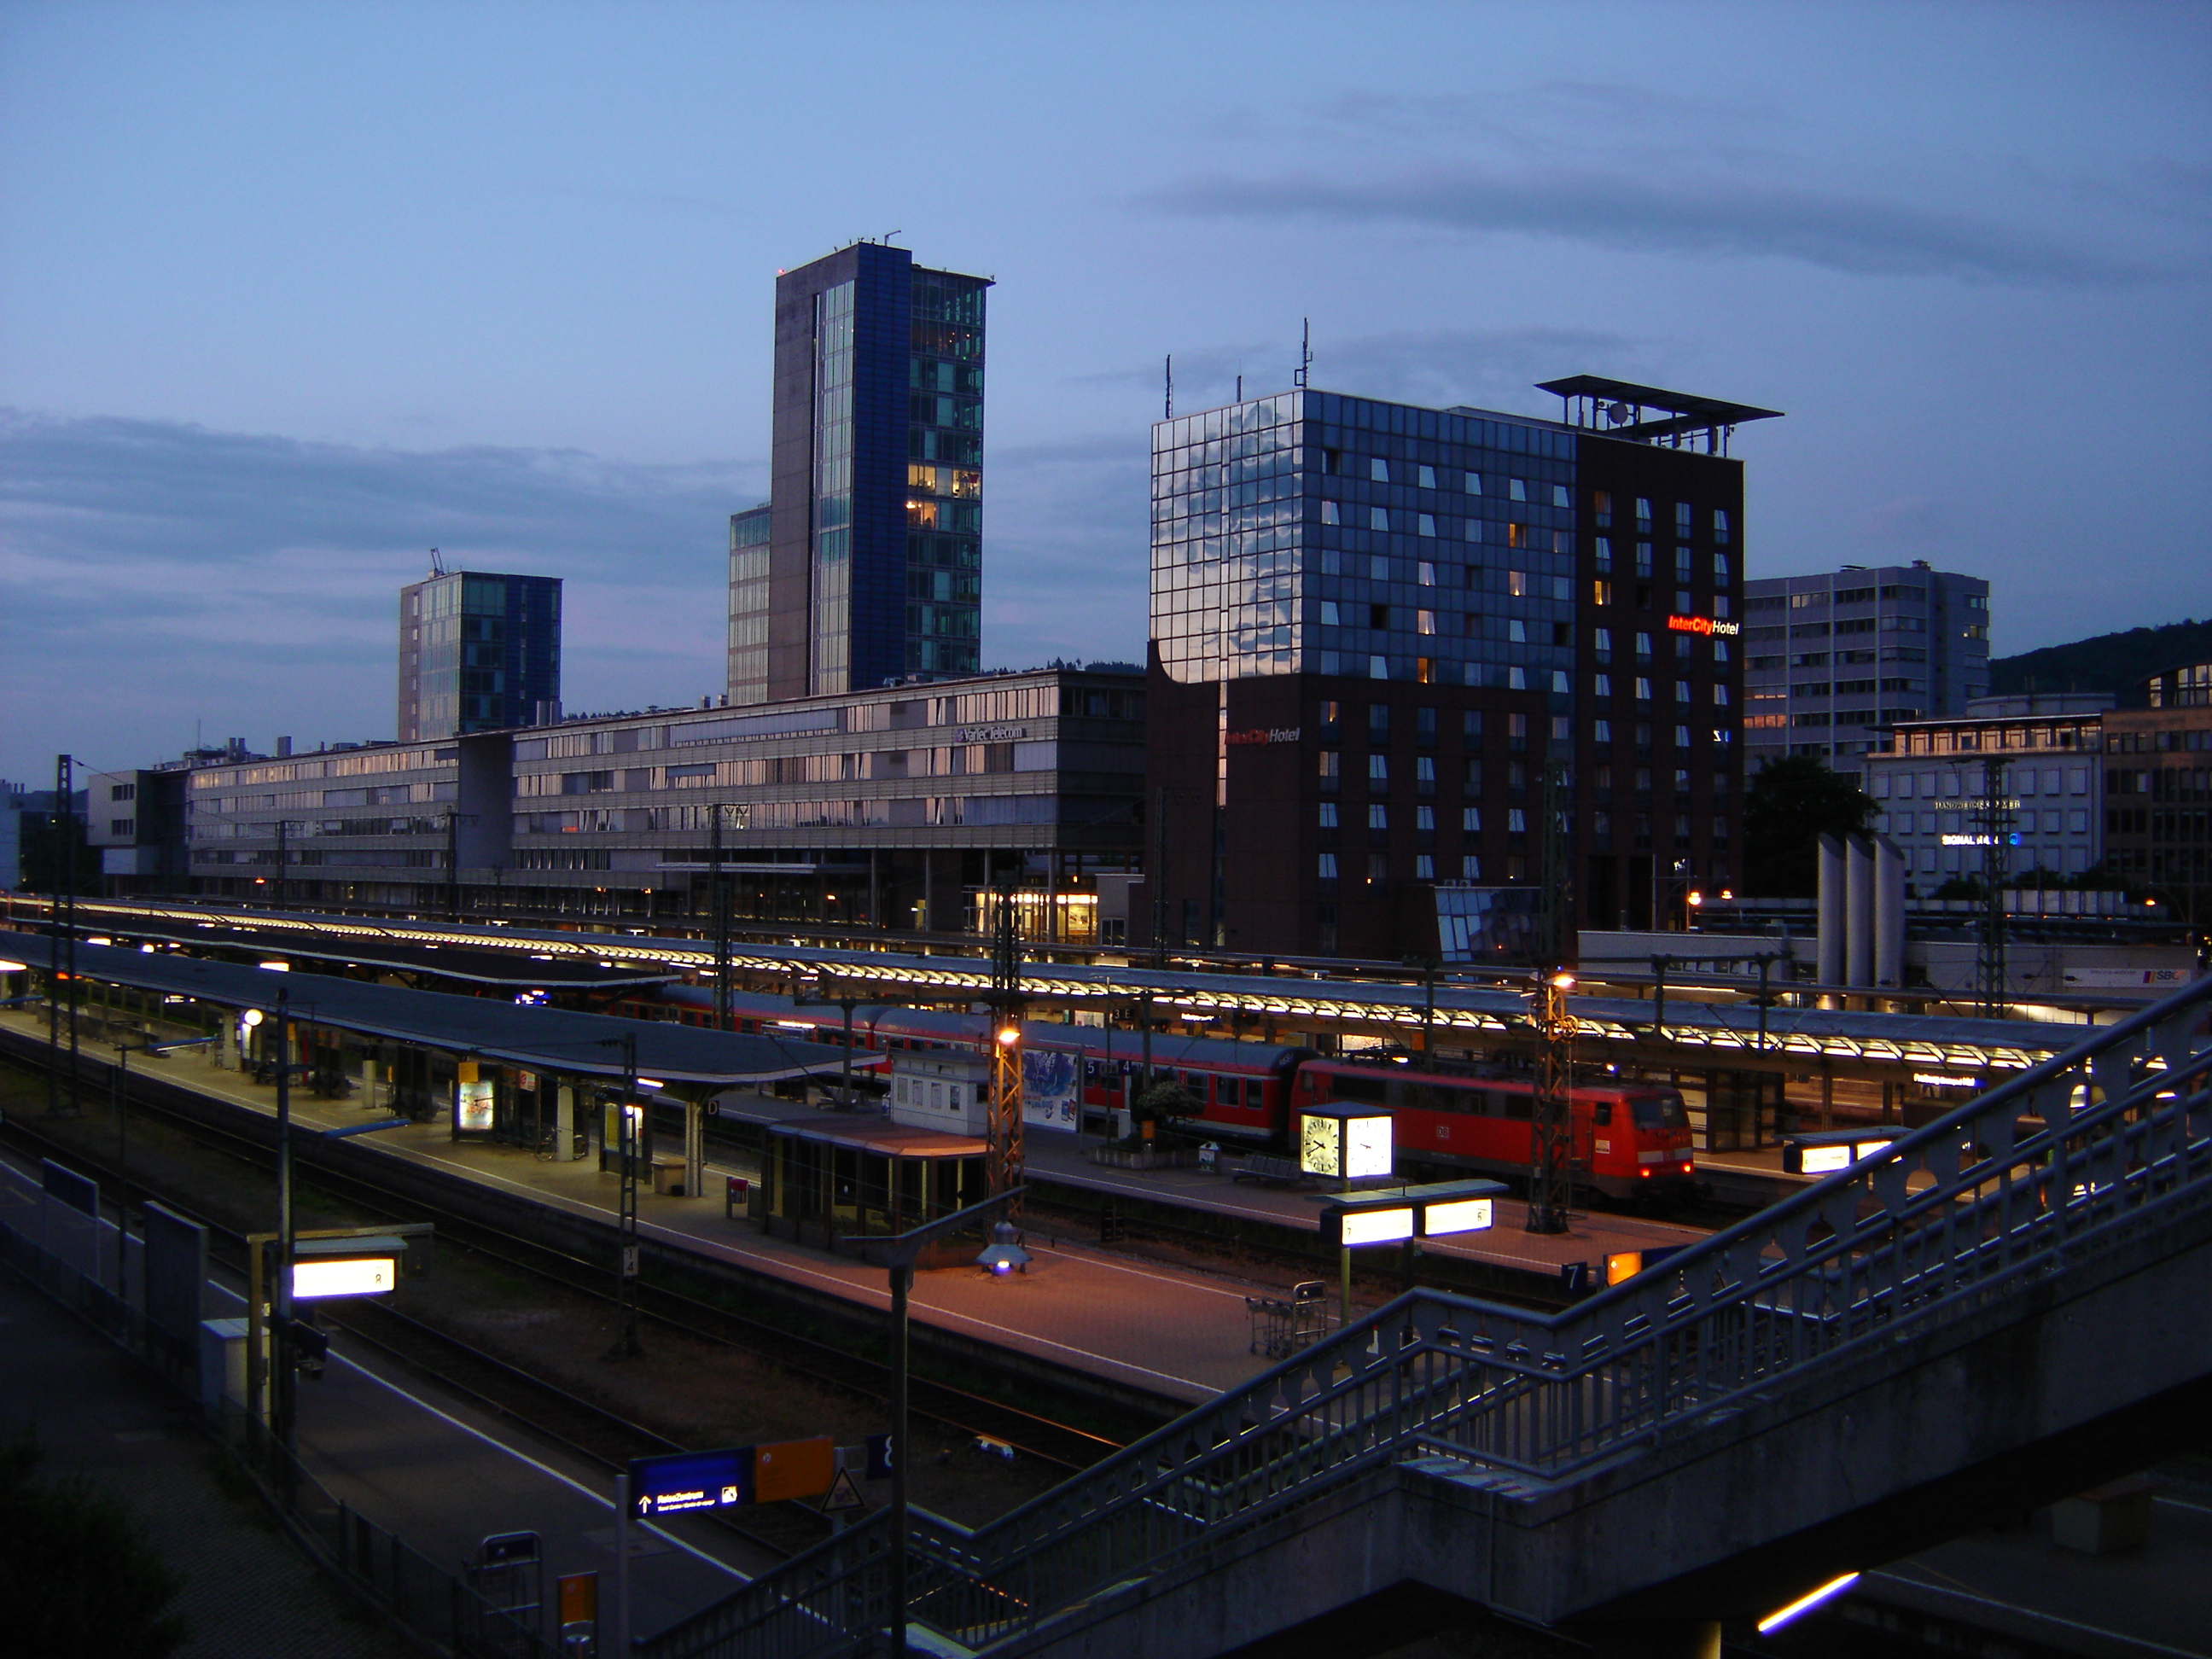 File0012 Freiburg HauptbahnhofJPG Wikimedia Commons